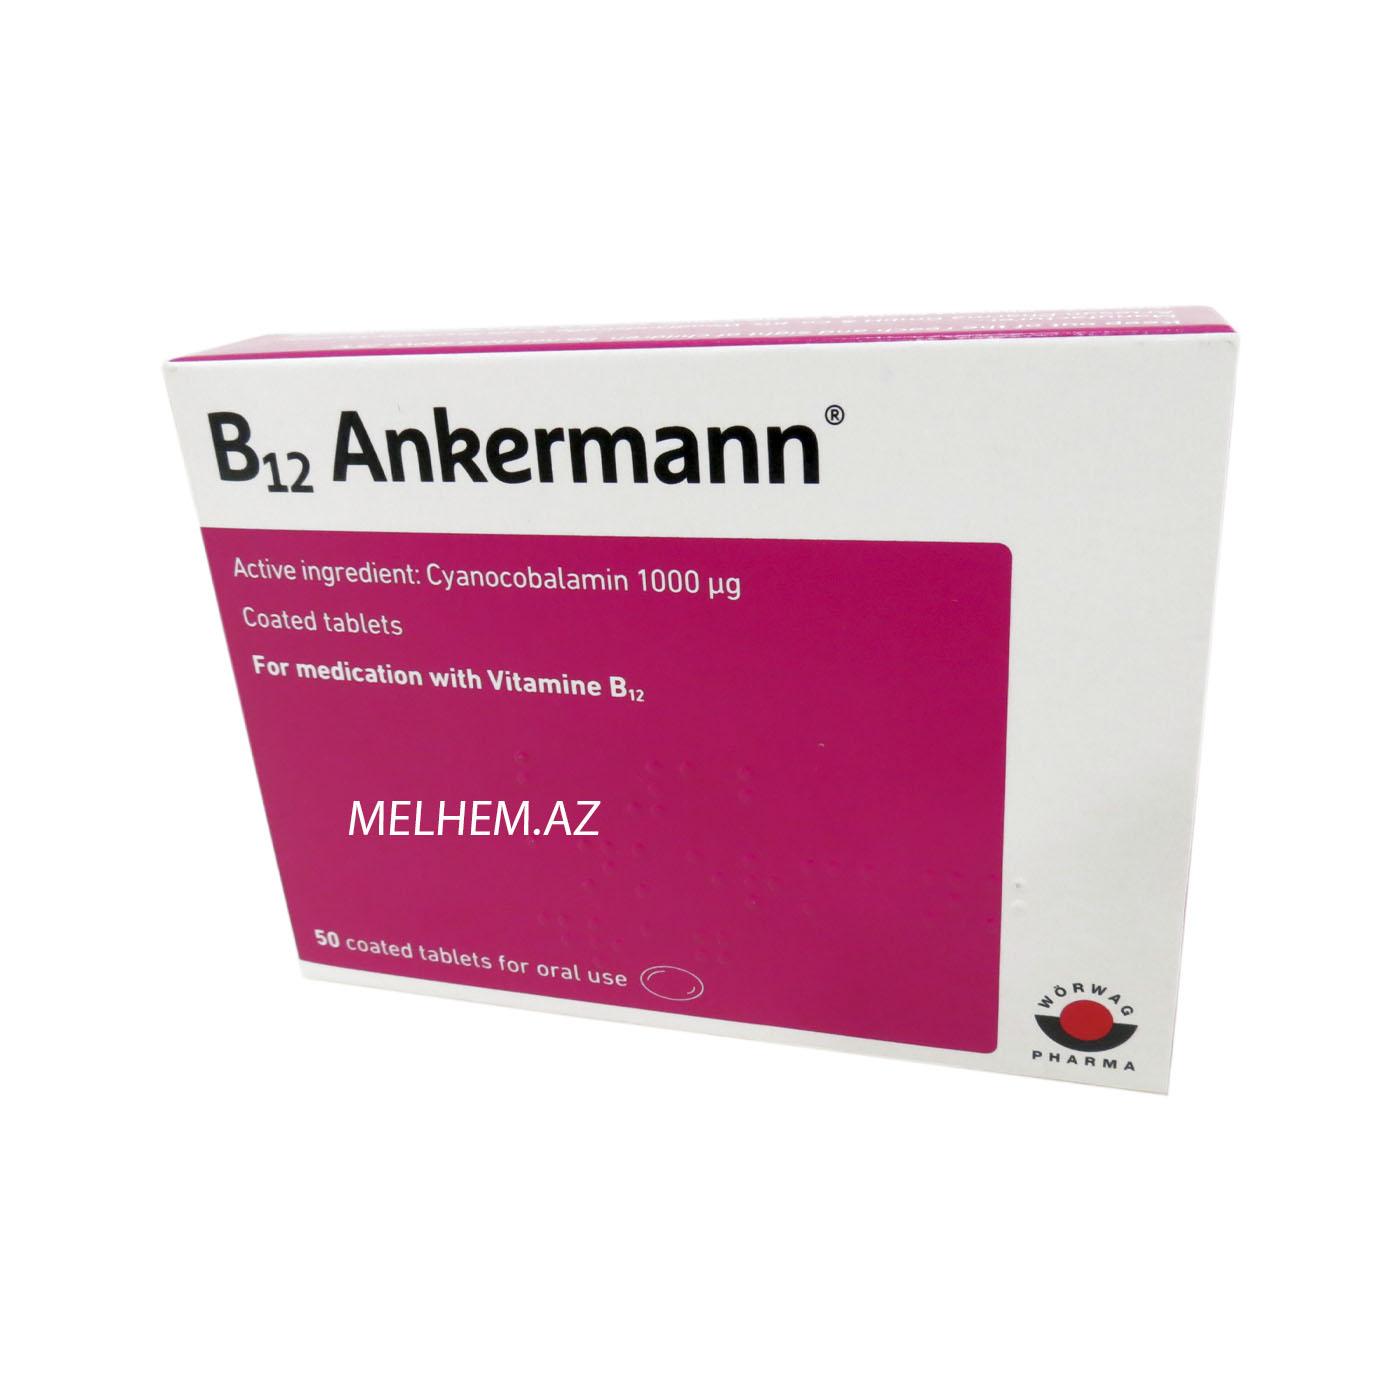 B12 ANKERMAN